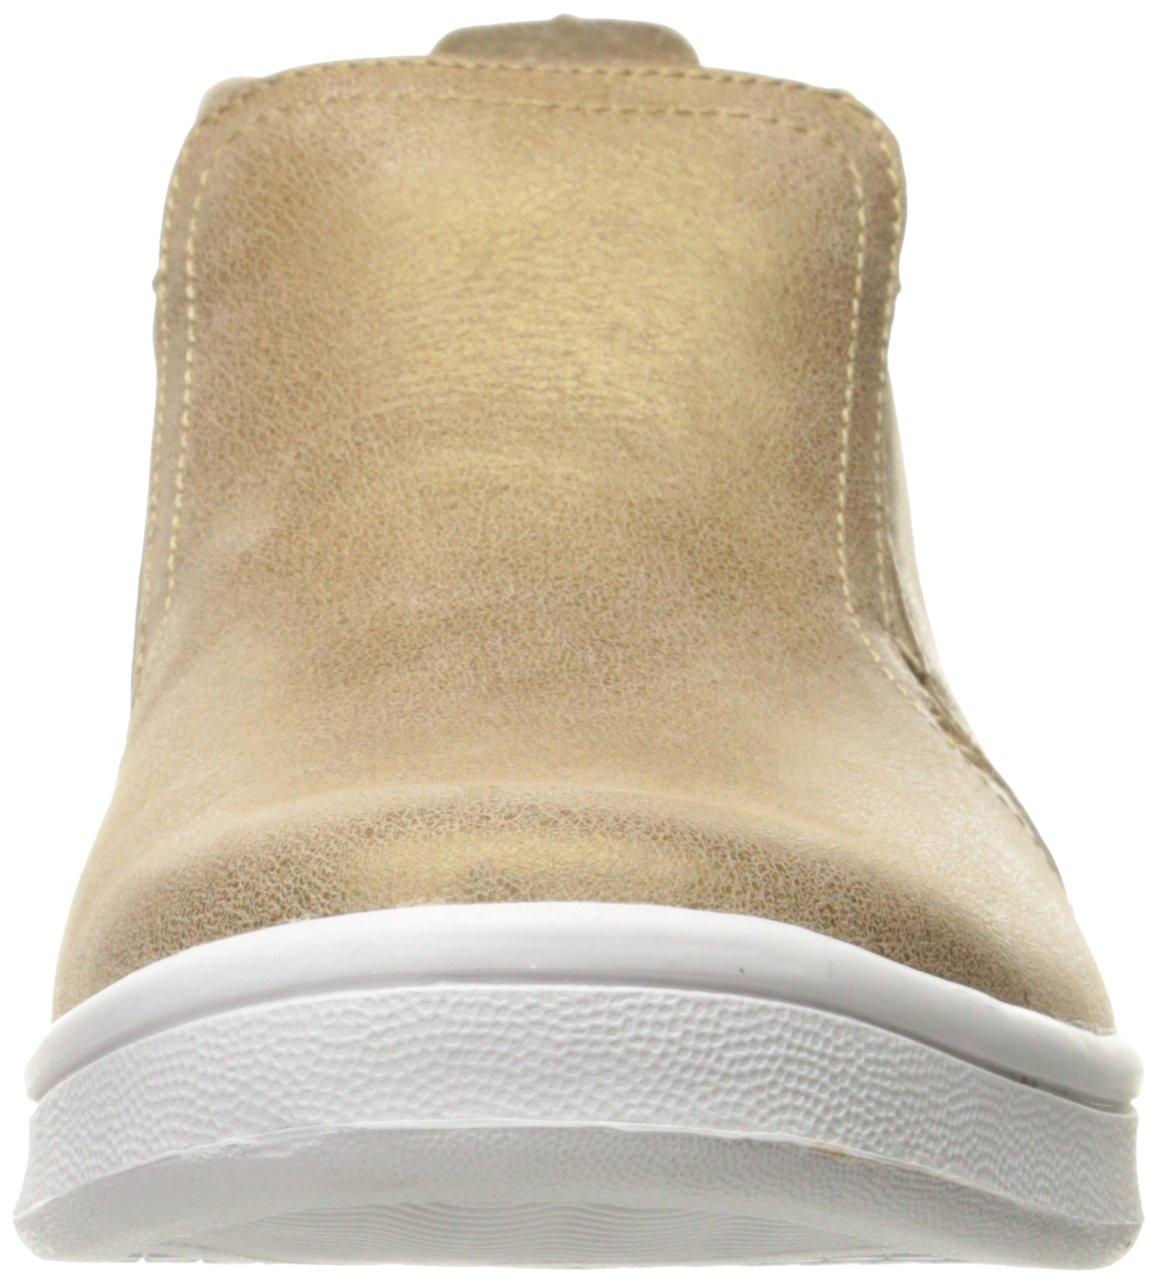 Mark Nason Los Angeles Women's Uptown Fashion Sneaker B06XGLH2ZQ 11 B(M) US|Gold